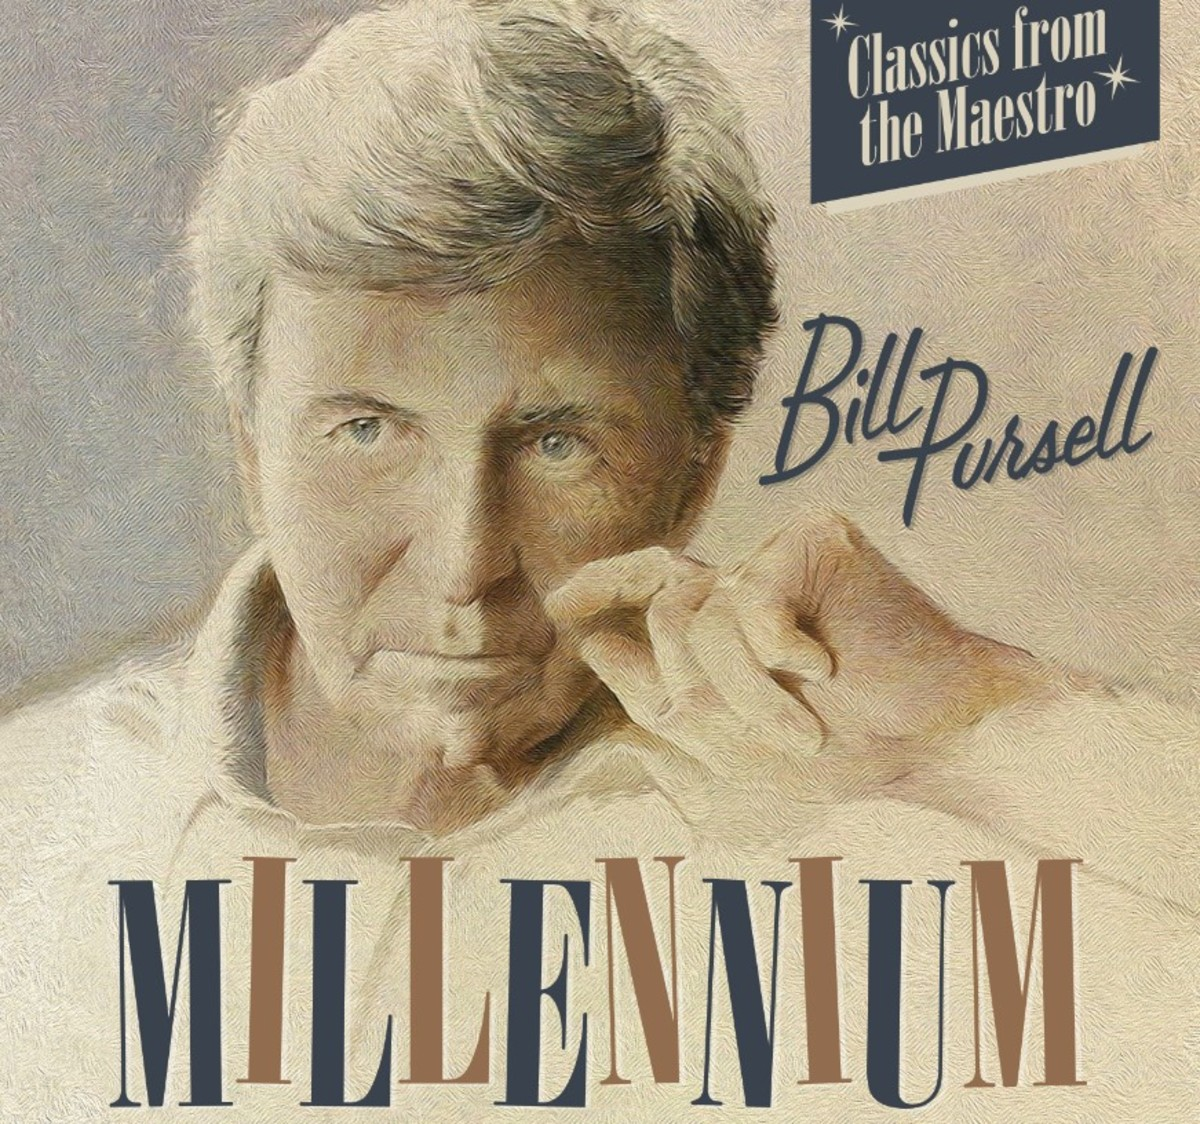 Bill Pursell Millennium